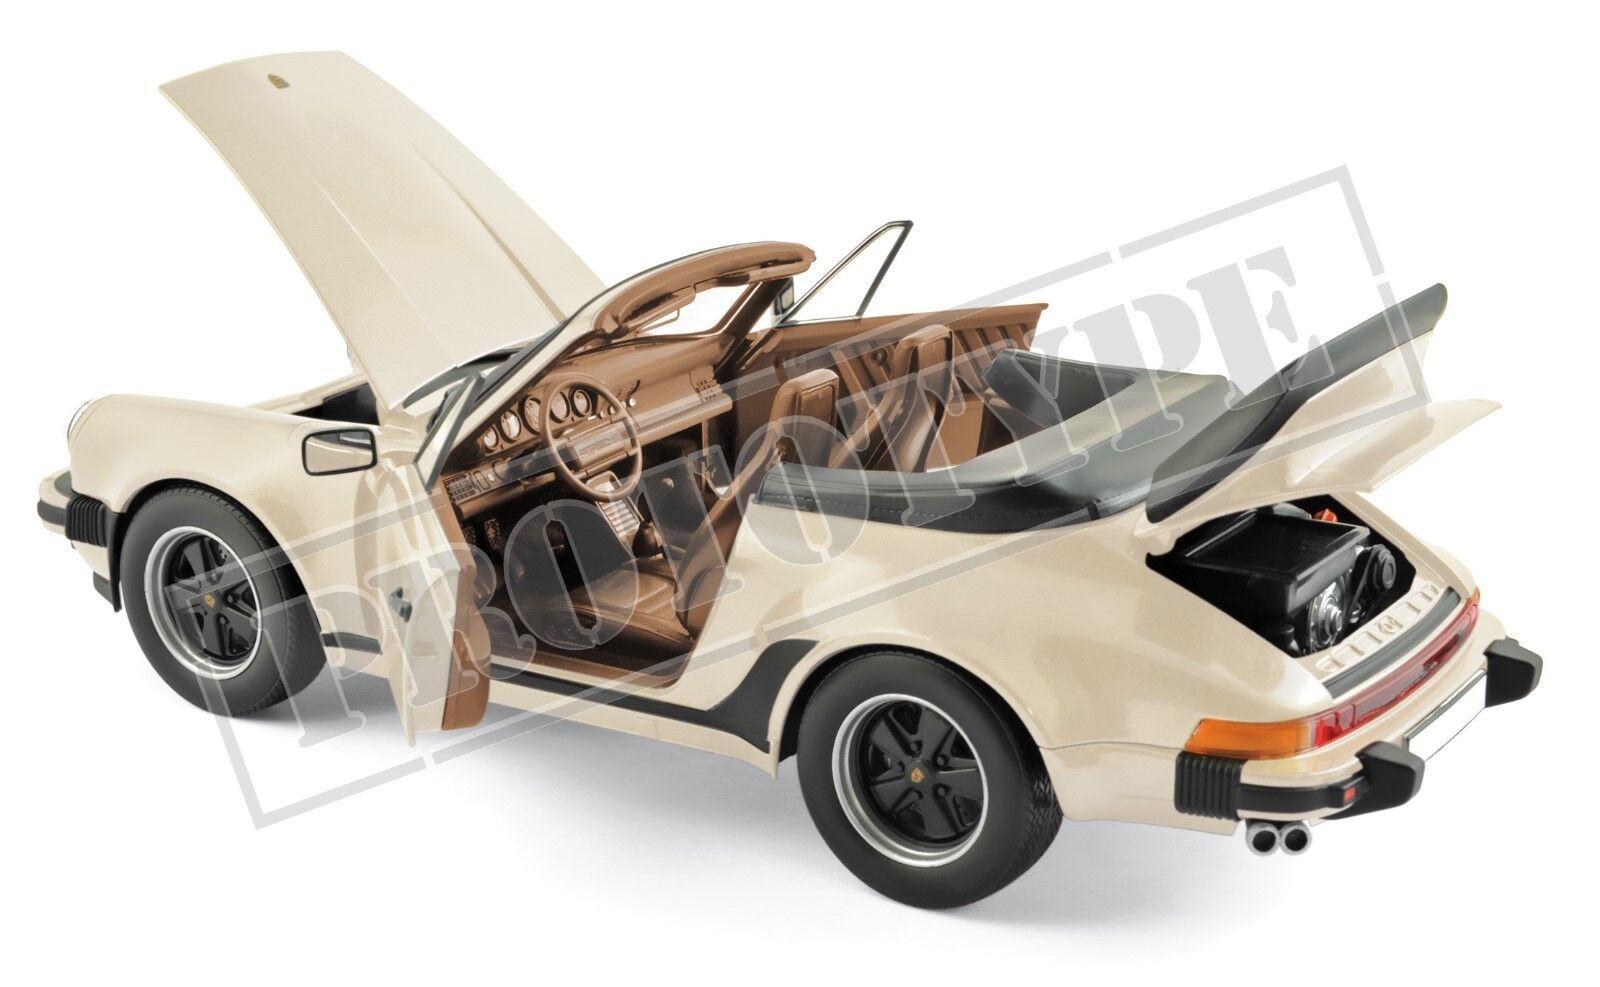 Porsche 911 turbo cabrio 1987 Ivory 1 18 norev 187661 nuevo embalaje original &